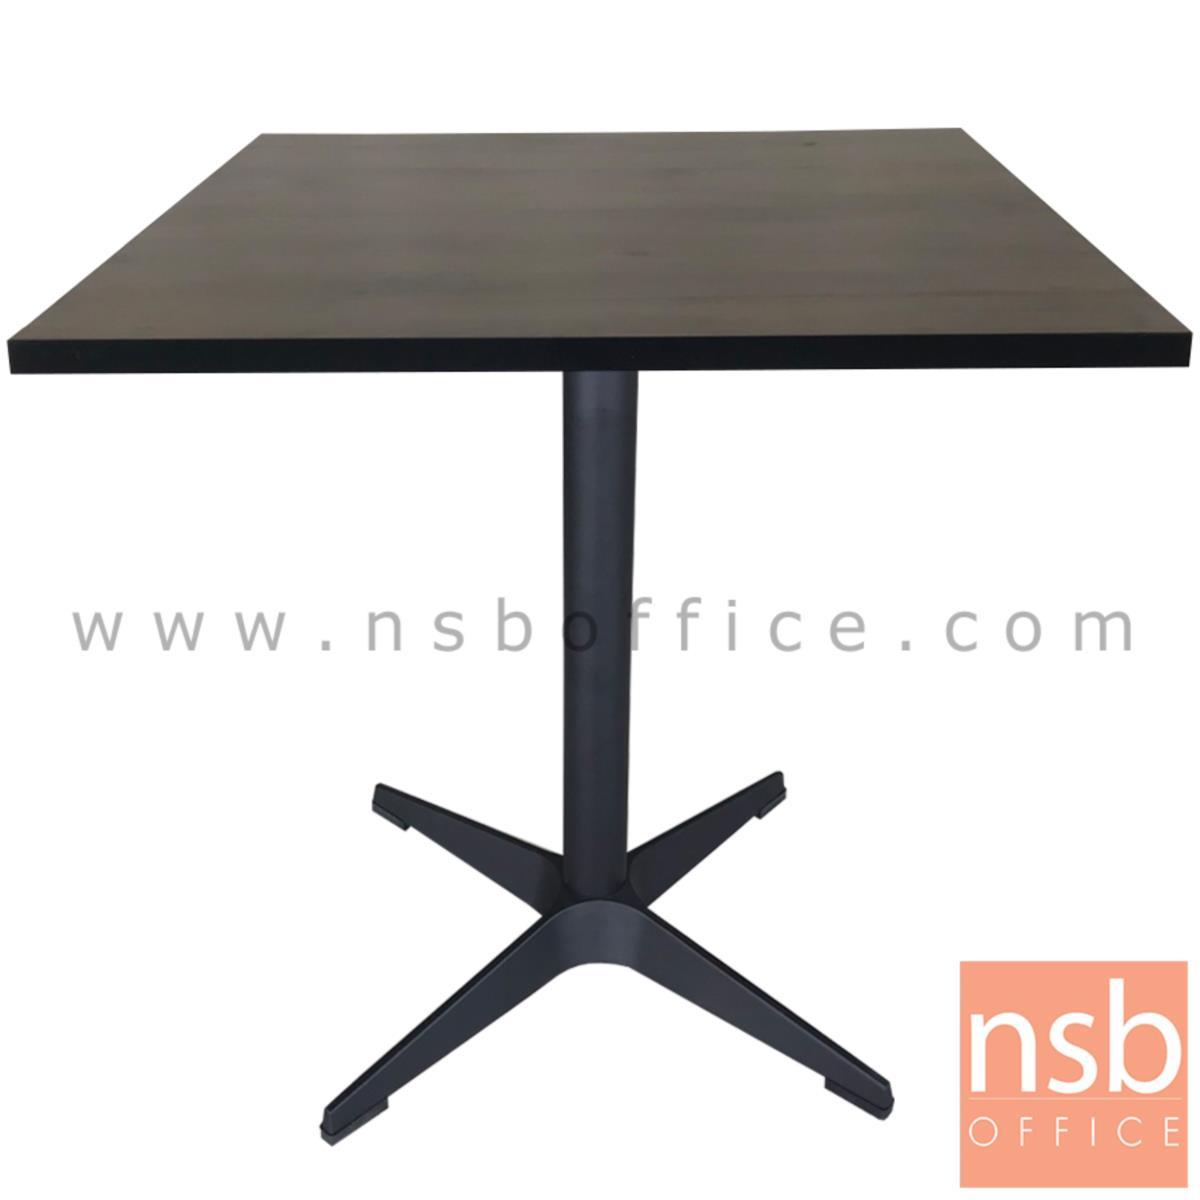 A14A168:โต๊ะบาร์ COFFEE รุ่น Lovisa (โลวิซา)  ขนาด 60Di ,70Di ,60W ,70Wcm.  ขาสี่แฉกแบบเรียบ